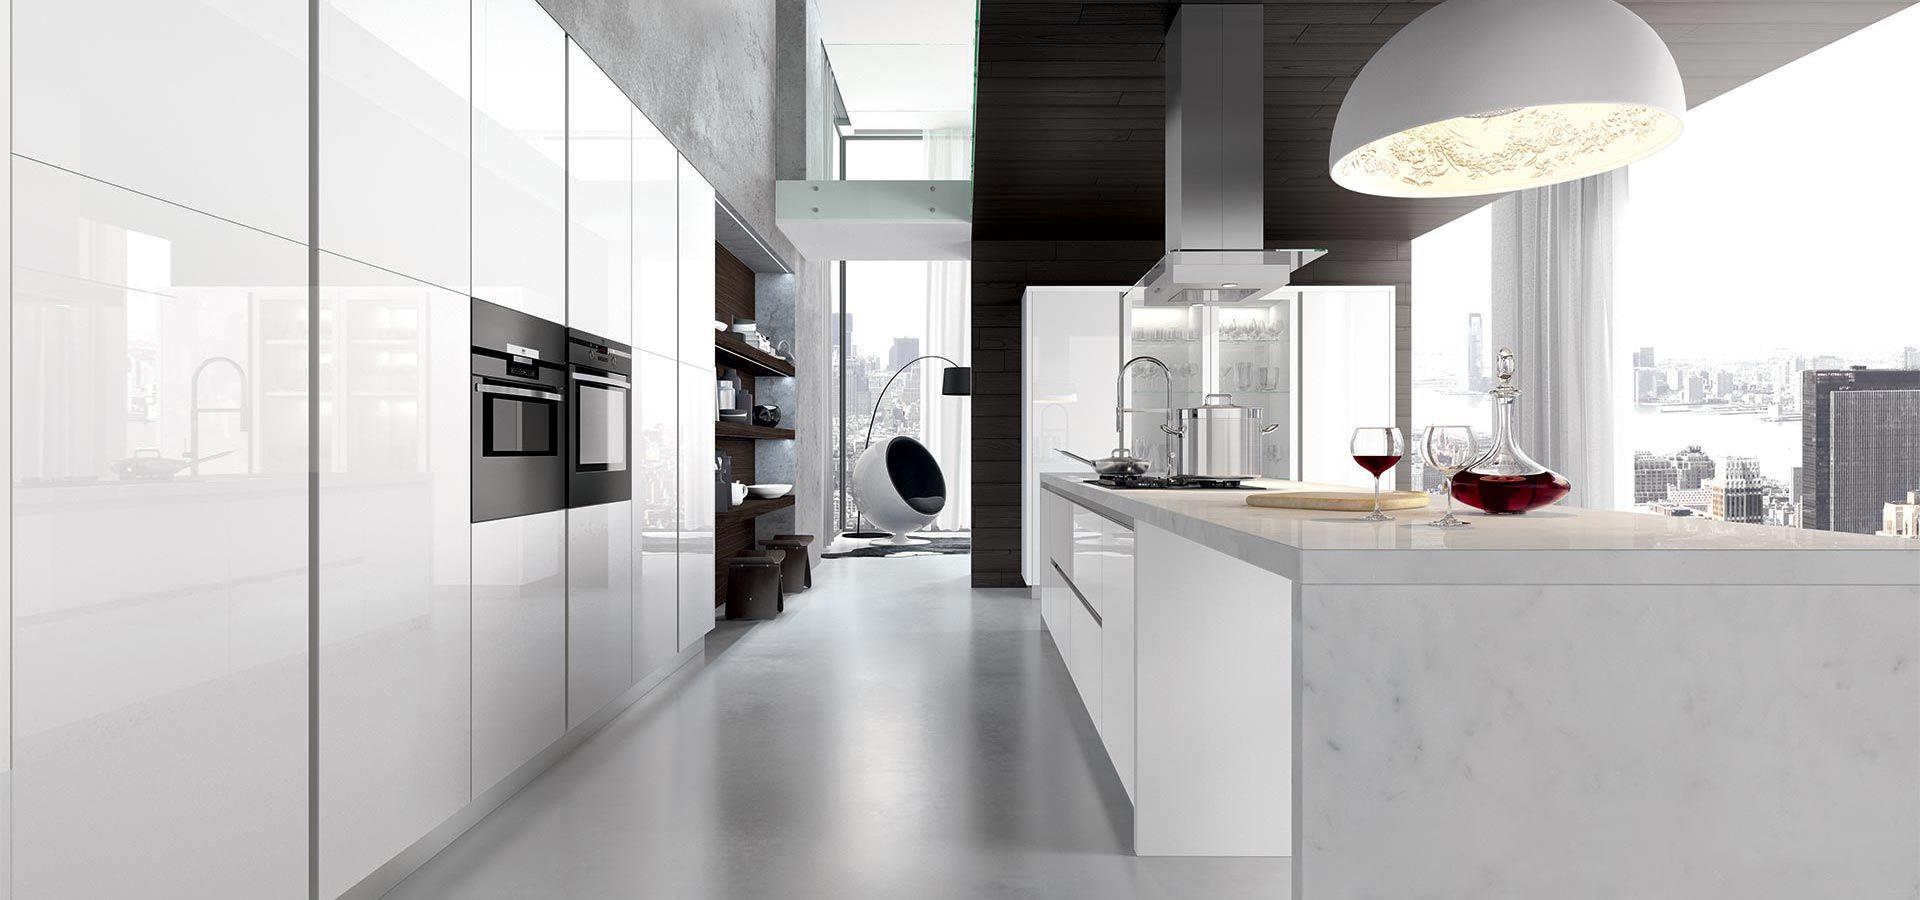 Cucina Moderna - GLASS Finitura vetro bianco lucido con telaio ...